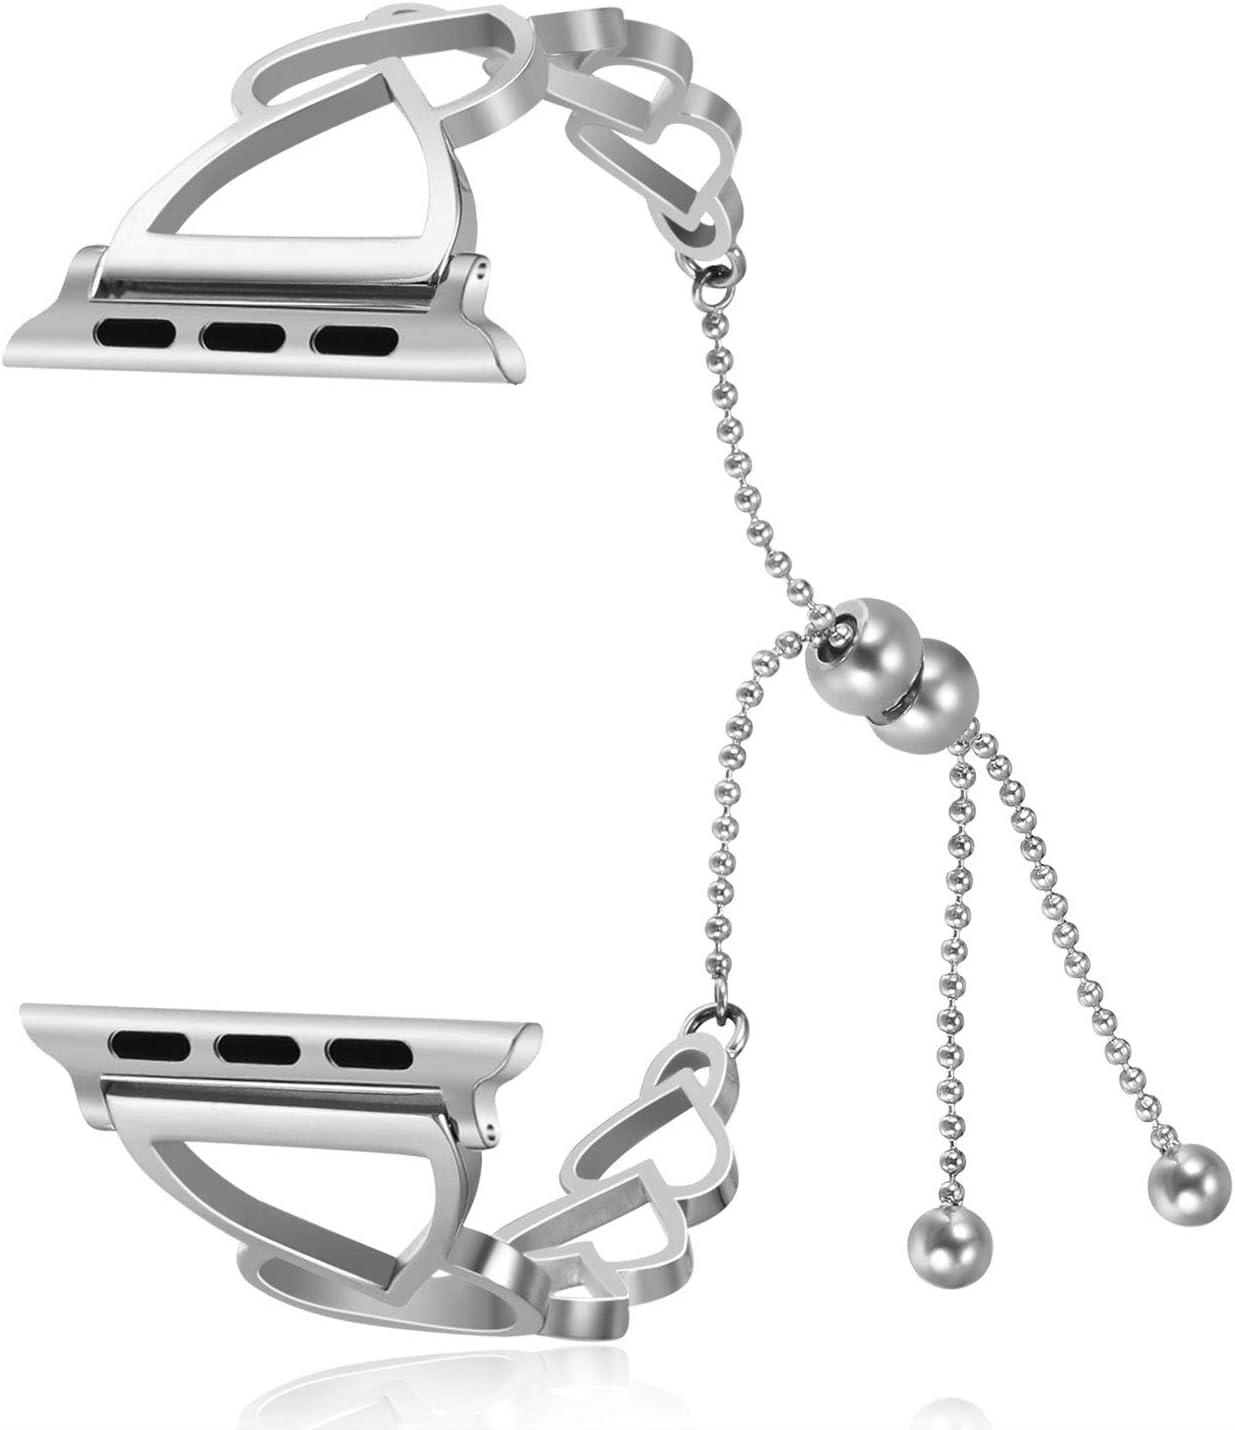 MeganStore Pulsera Compatible para Apple Watch Band 38 mm 40 mm 42 mm 44 mm, Love Heart Hollow out Acero Inoxidable joyería Brazalete Correa de Repuesto para iWatch Series 4, 3, 2, 1